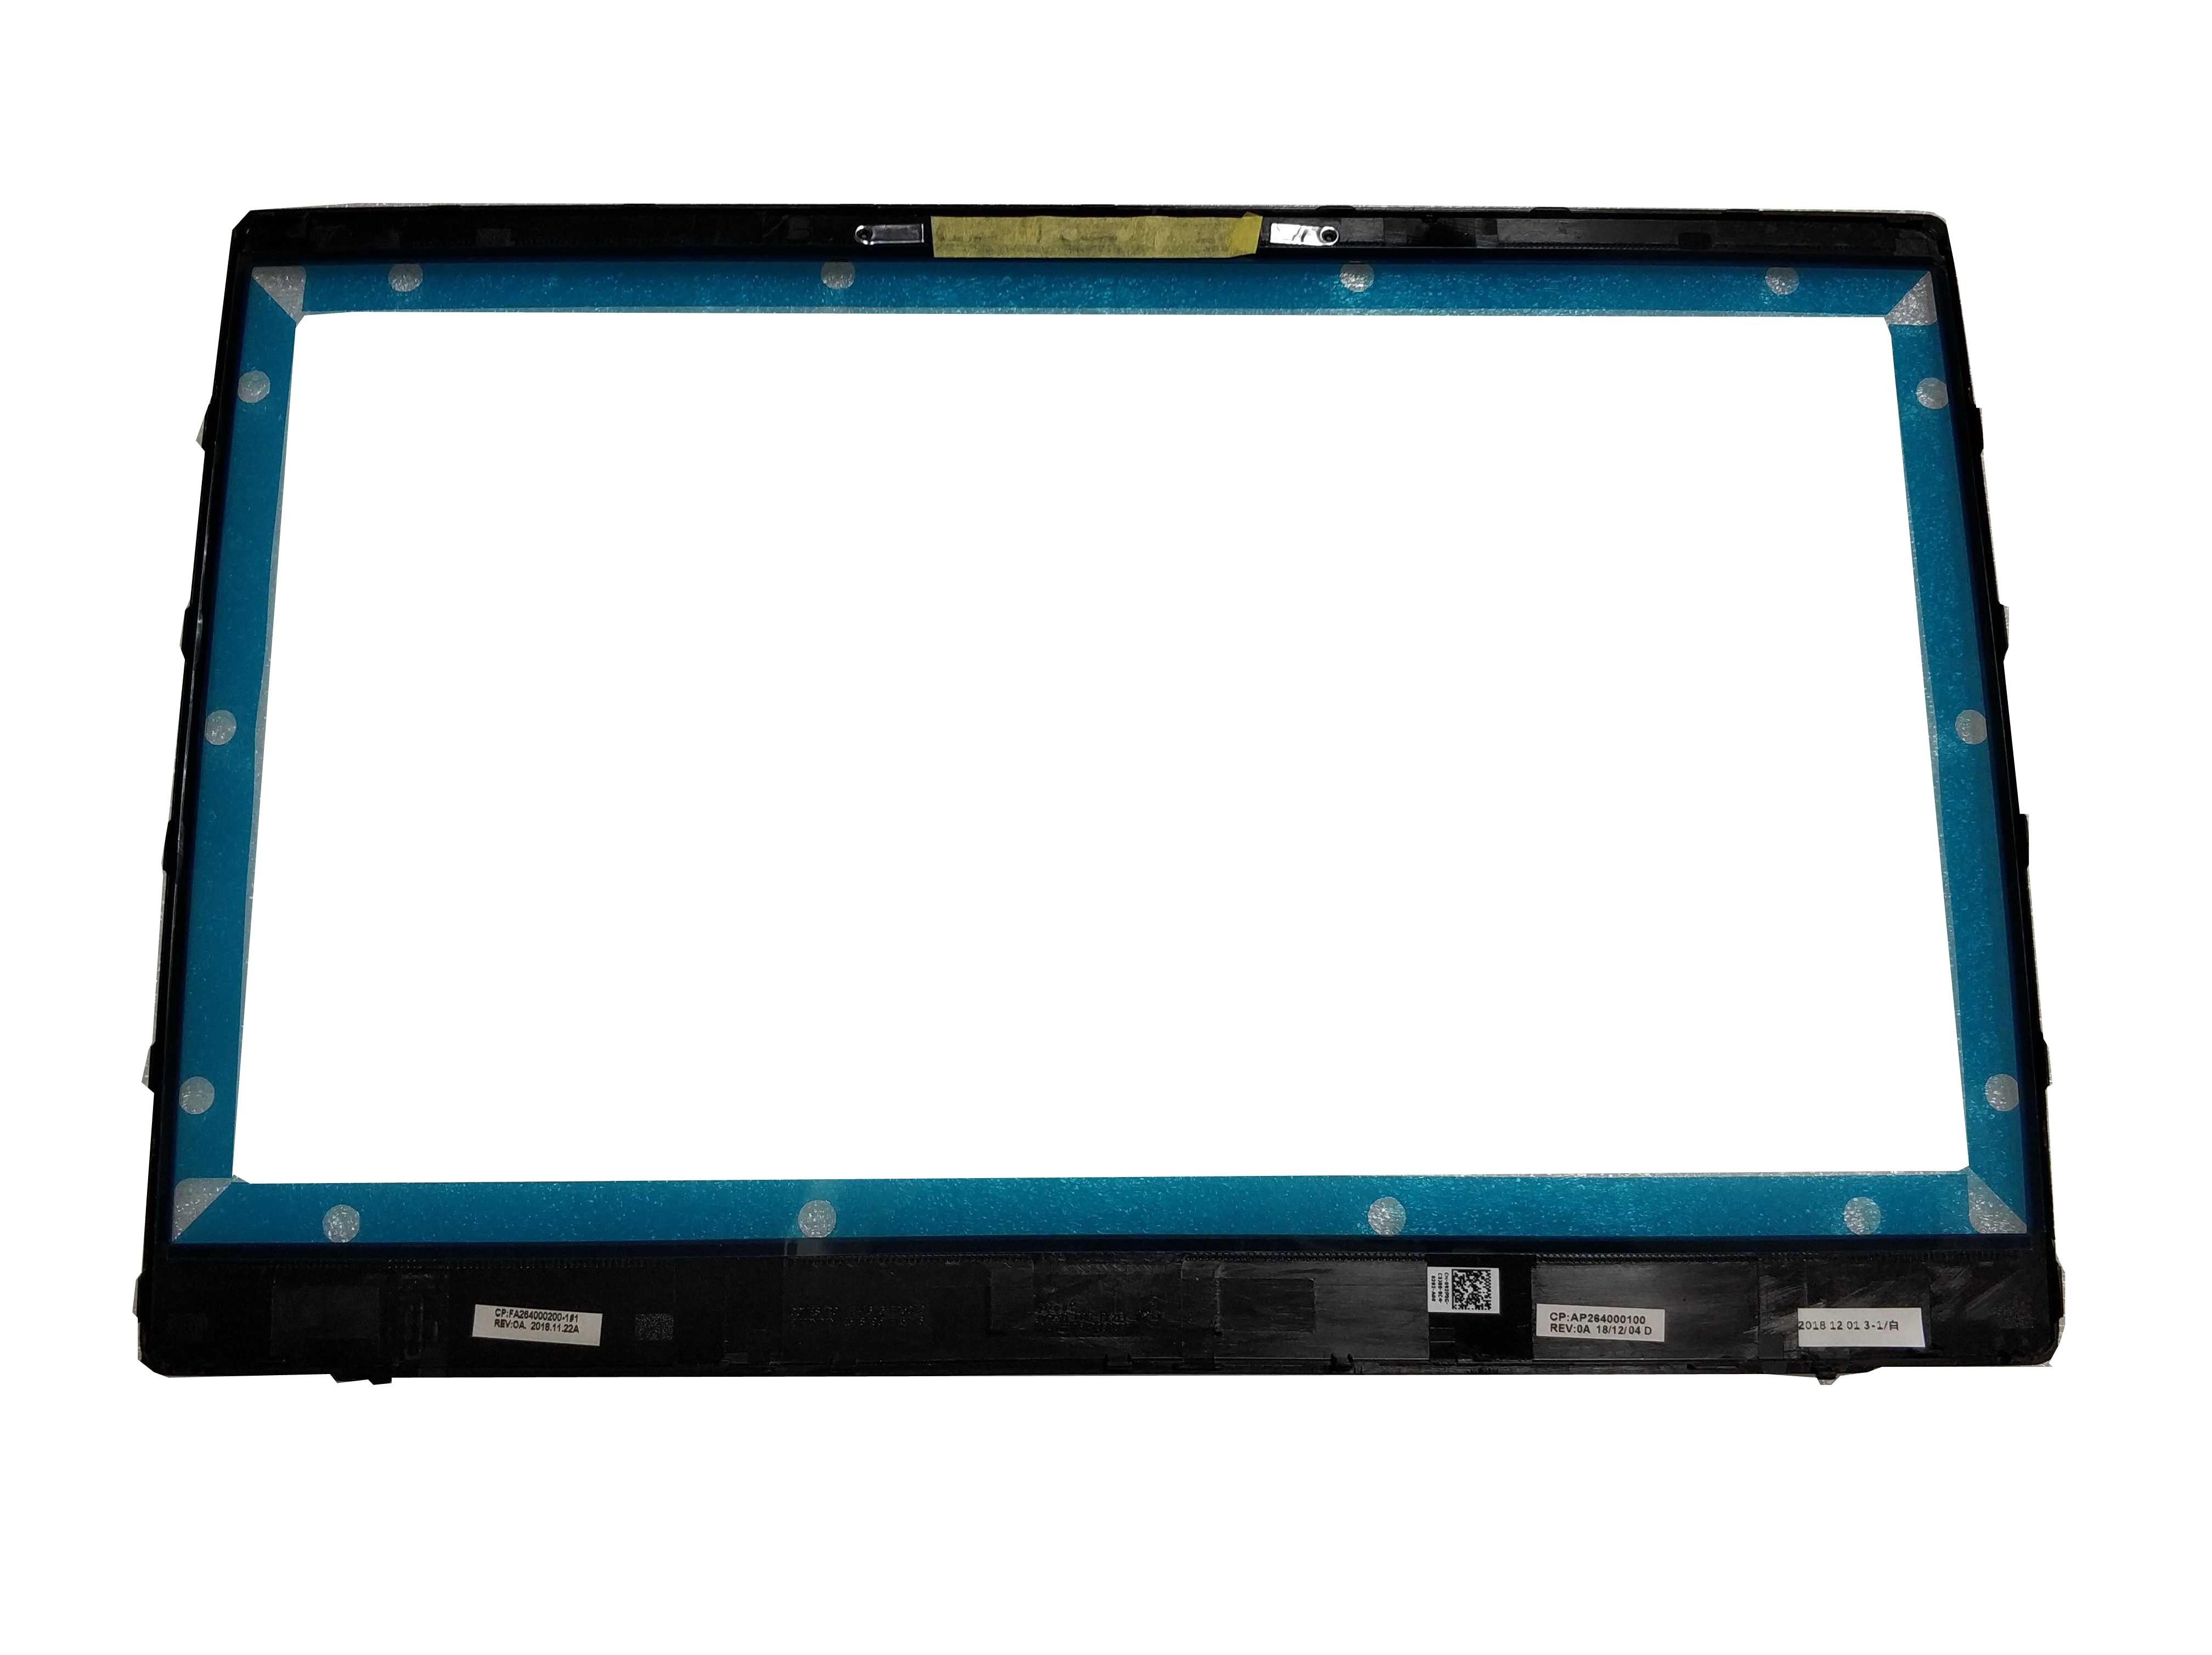 TPU Keyboard Protector Skin Fit DELL latitude 7390 7290 7380 E5270 E5290 E7389